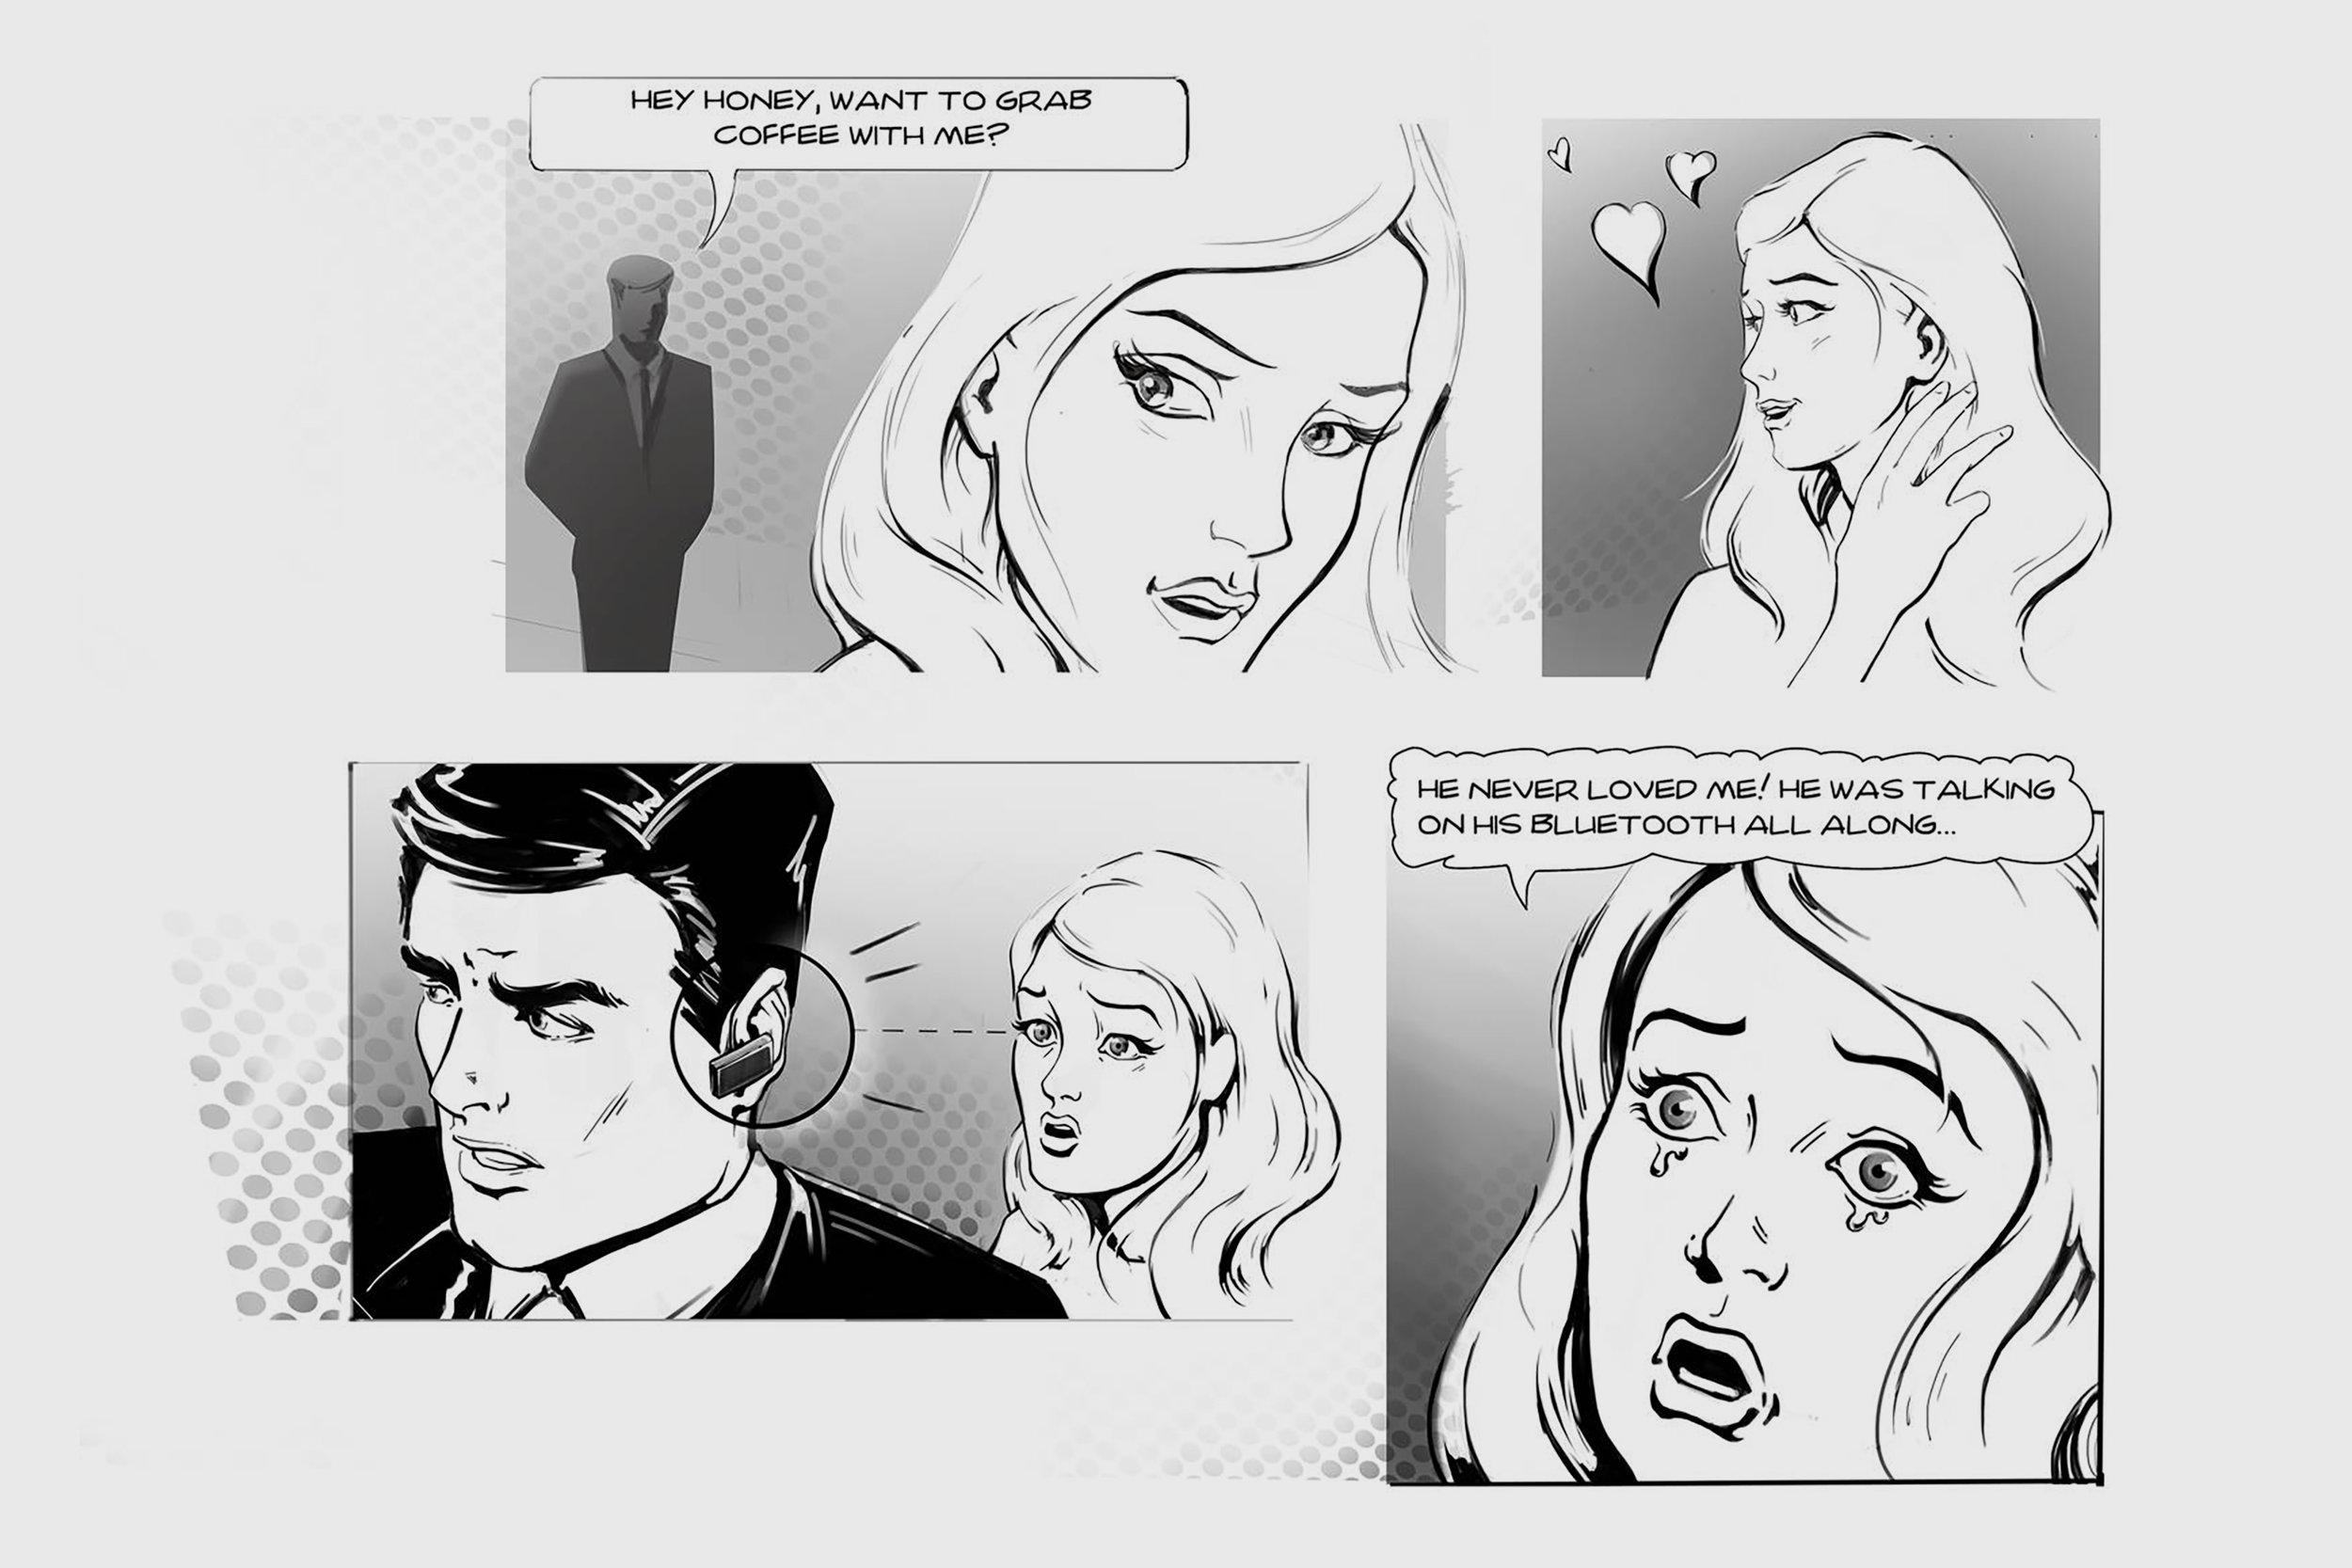 matson_bluetooth_heartbreak_comic.jpg